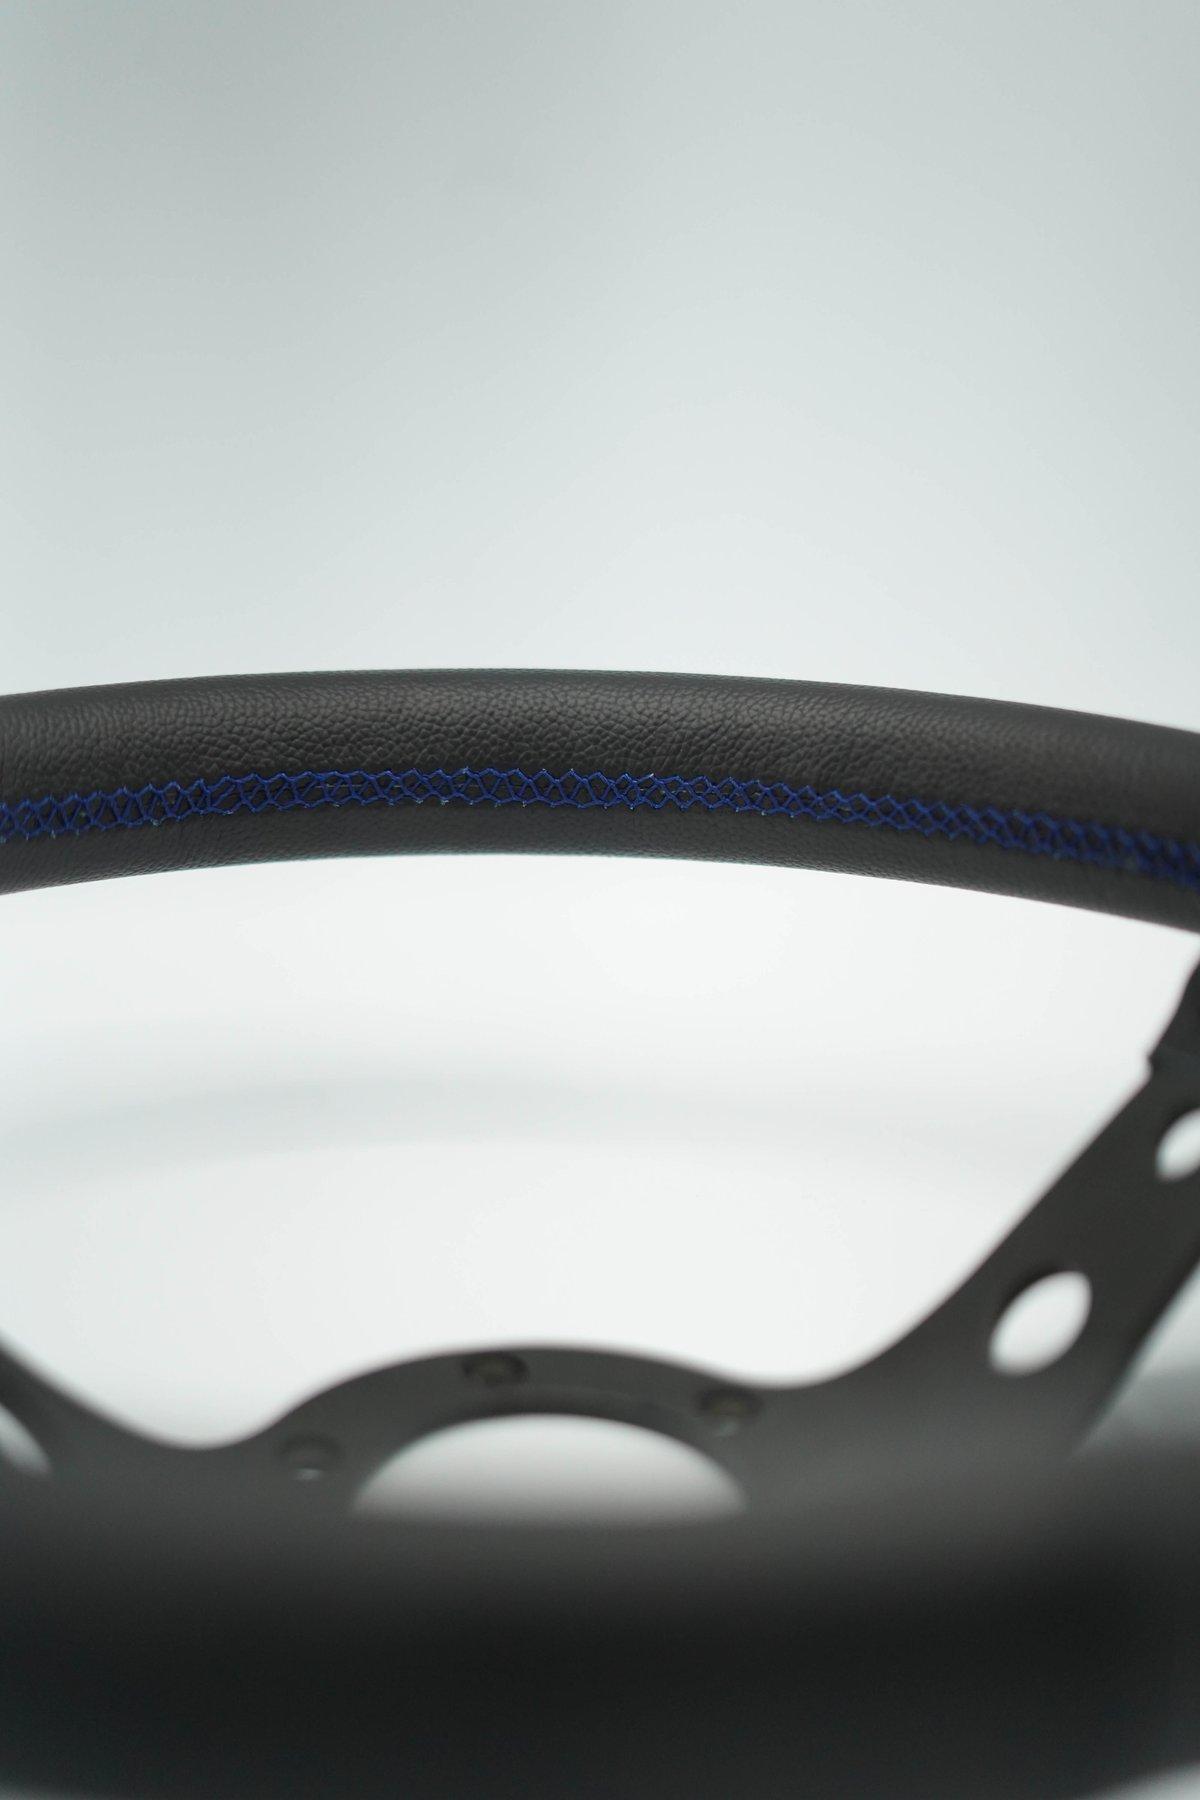 Image of Daytona Leather Race Wheel